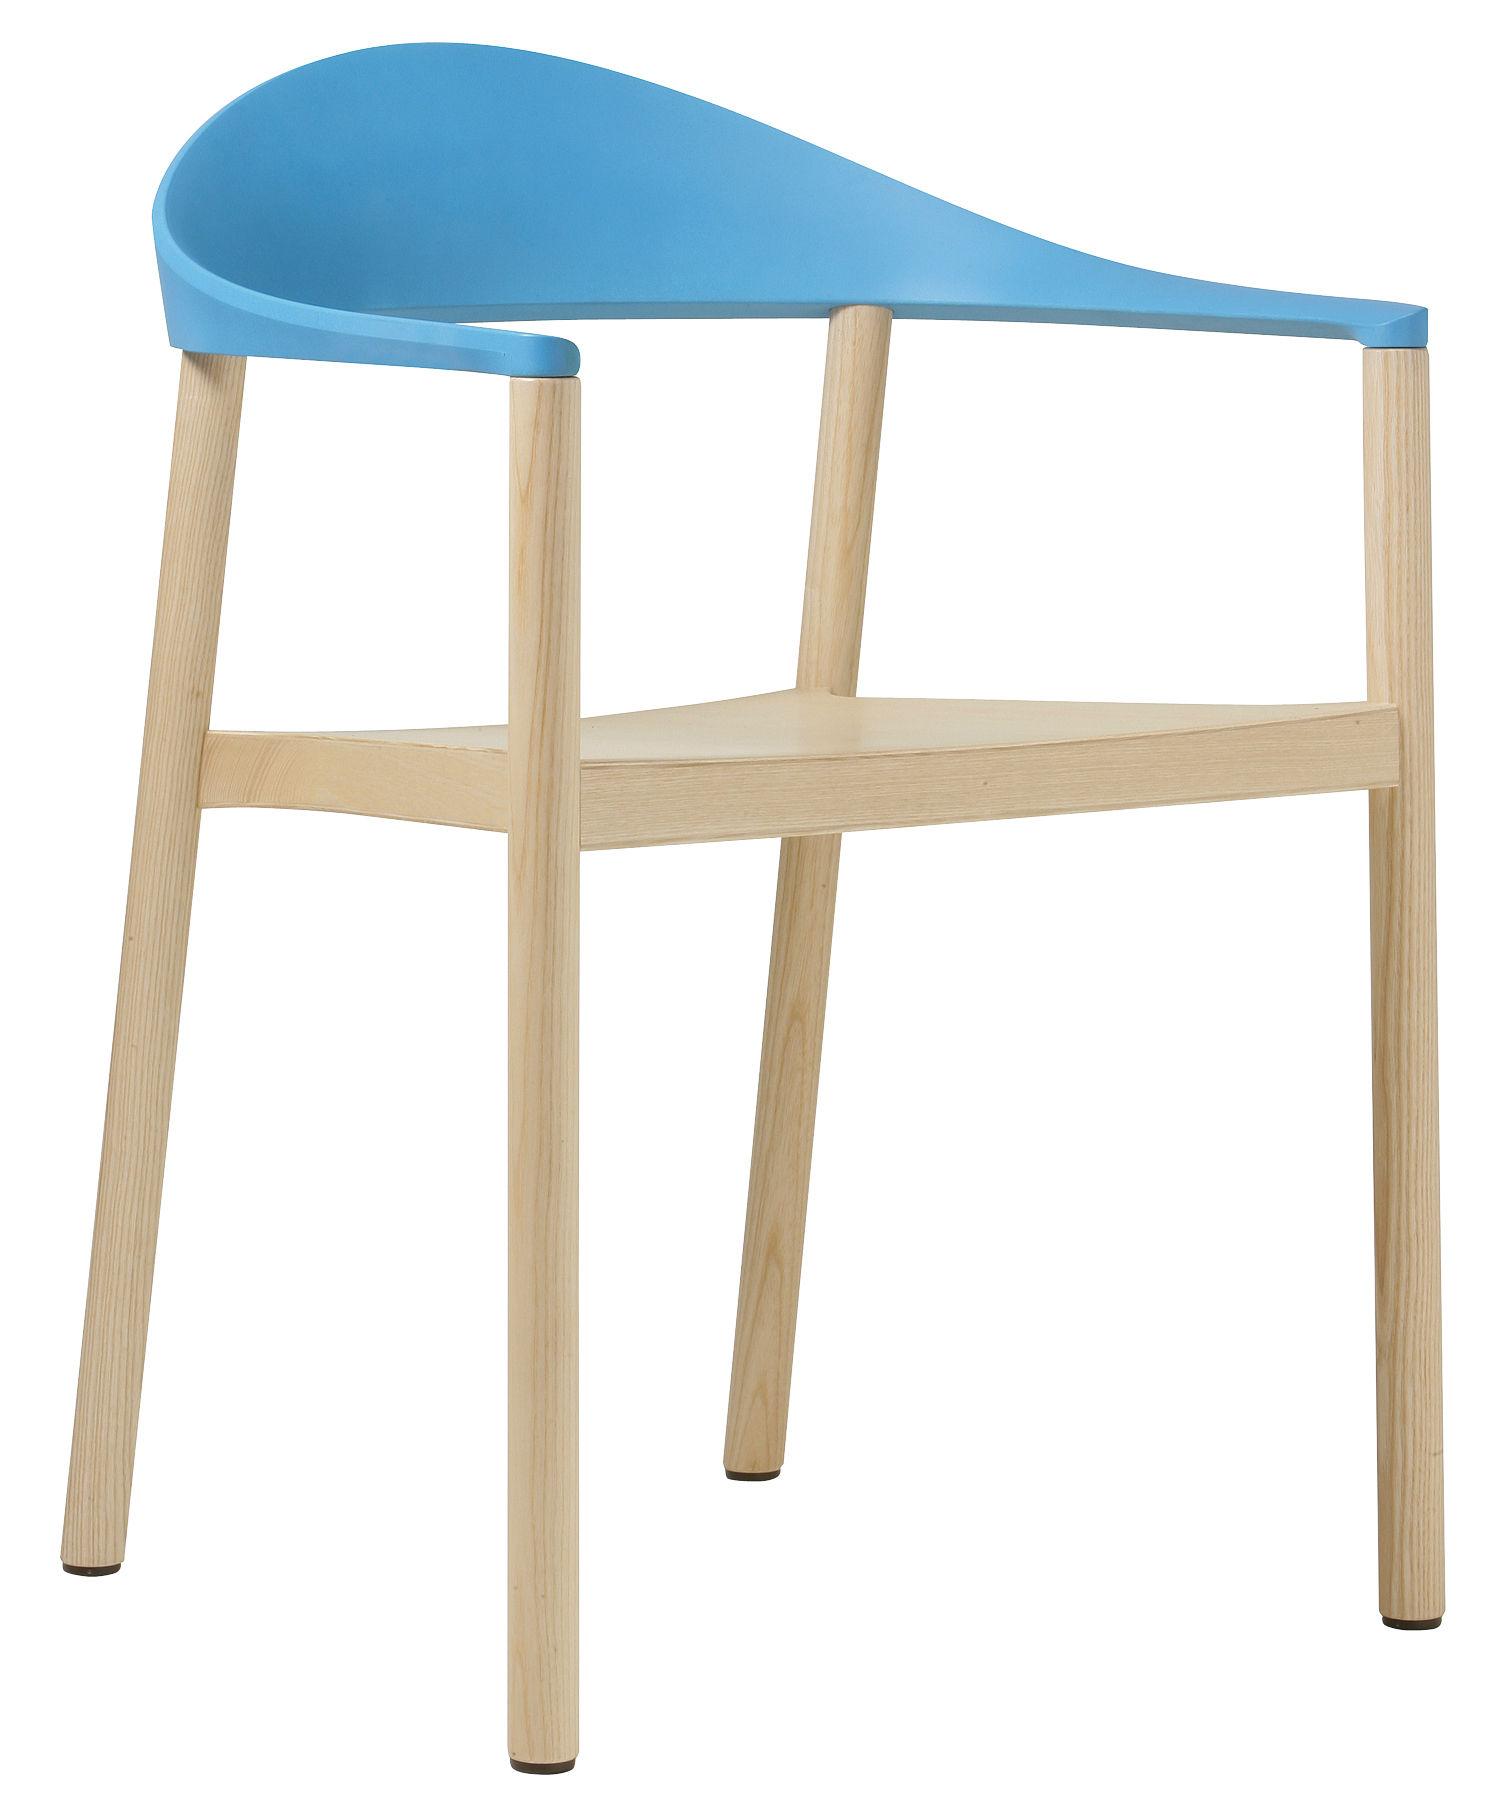 monza stackable armchair plastic wood natural blue backrest by plank made in design uk. Black Bedroom Furniture Sets. Home Design Ideas